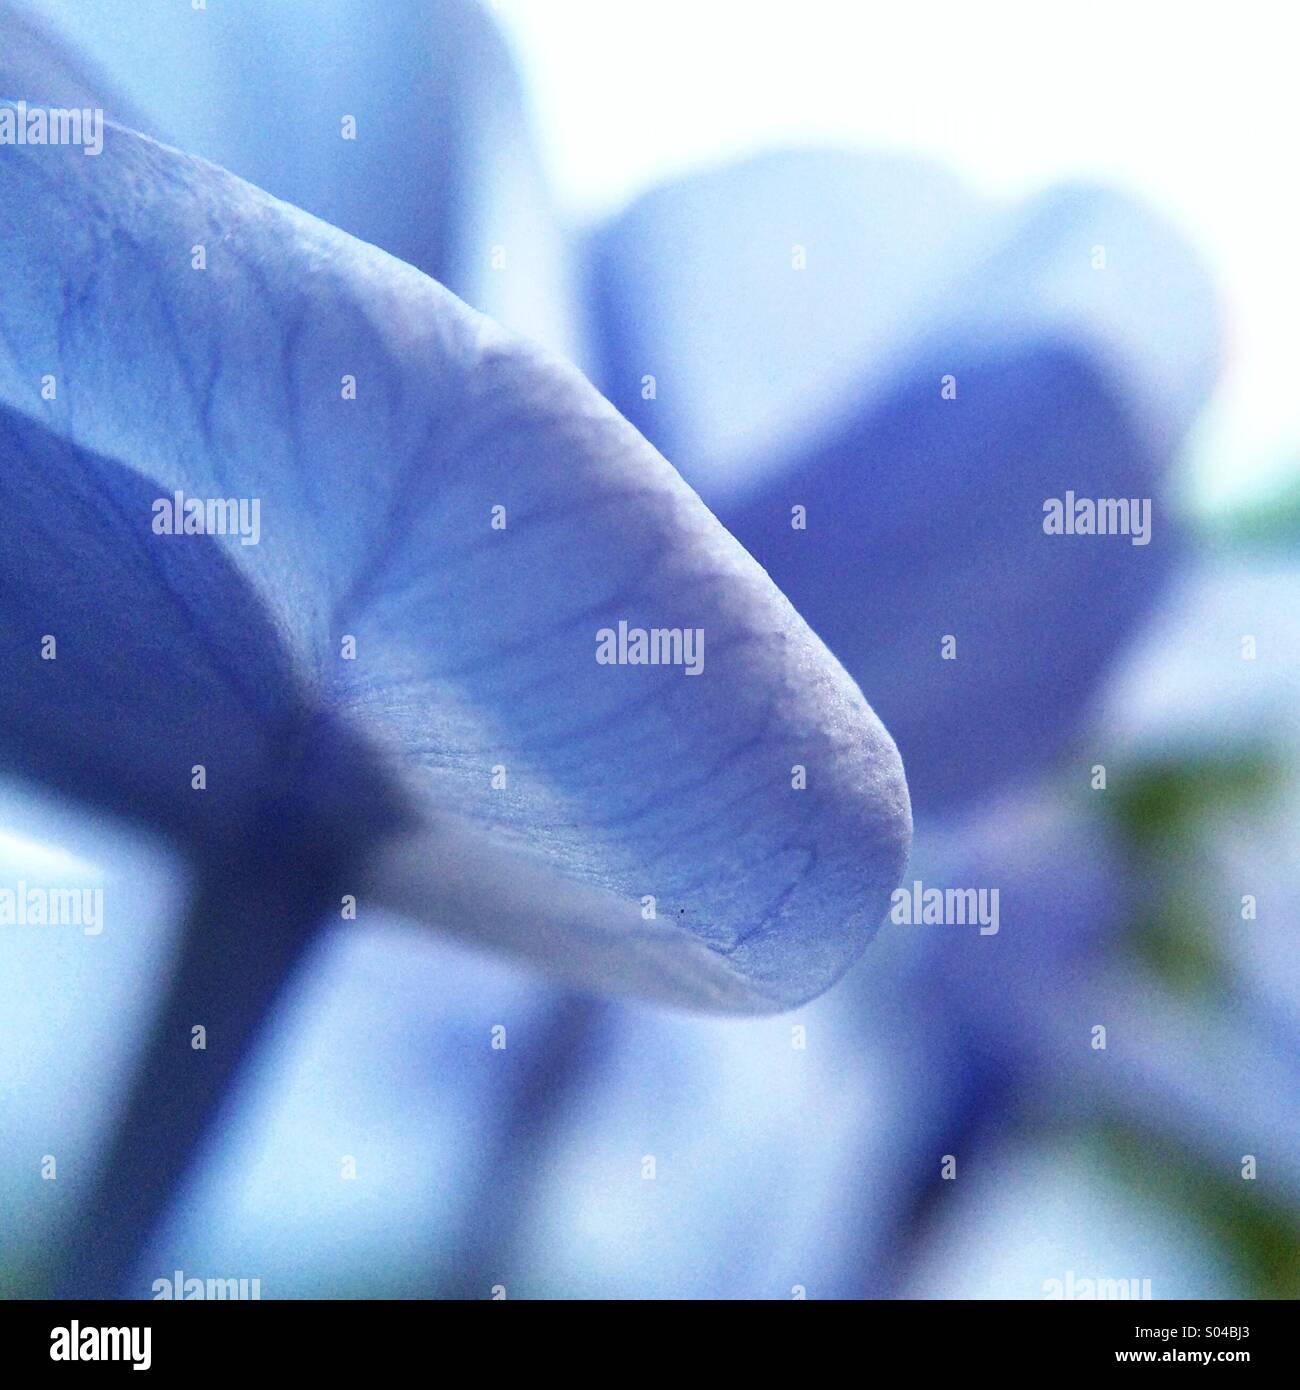 Macro of blue petals - Stock Image